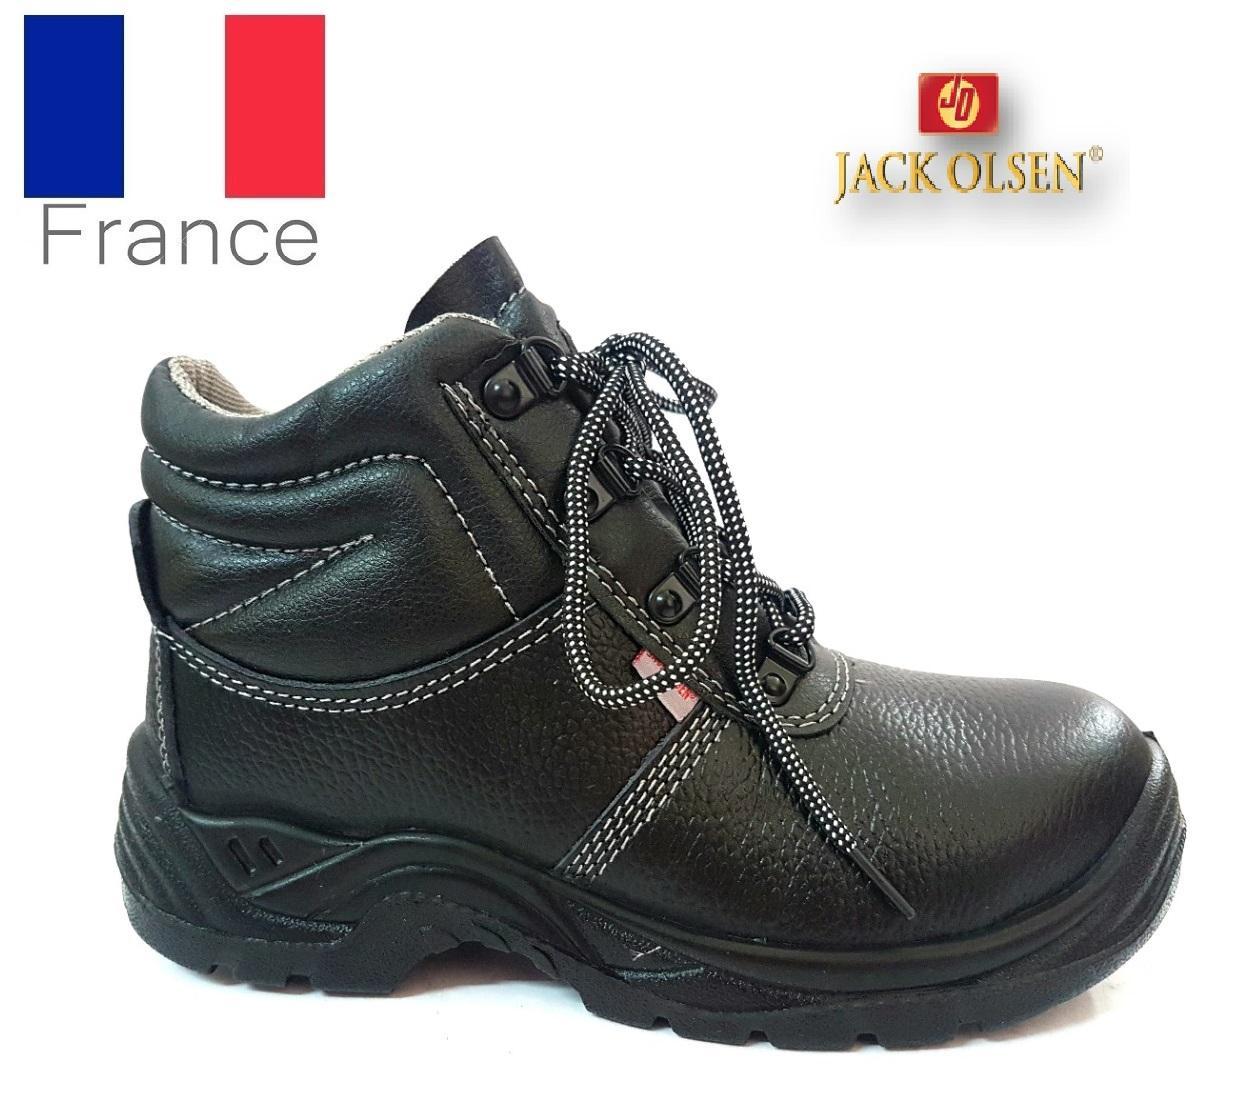 Giày bảo hộ cao cổ Jack Olsen SF855 - Pháp